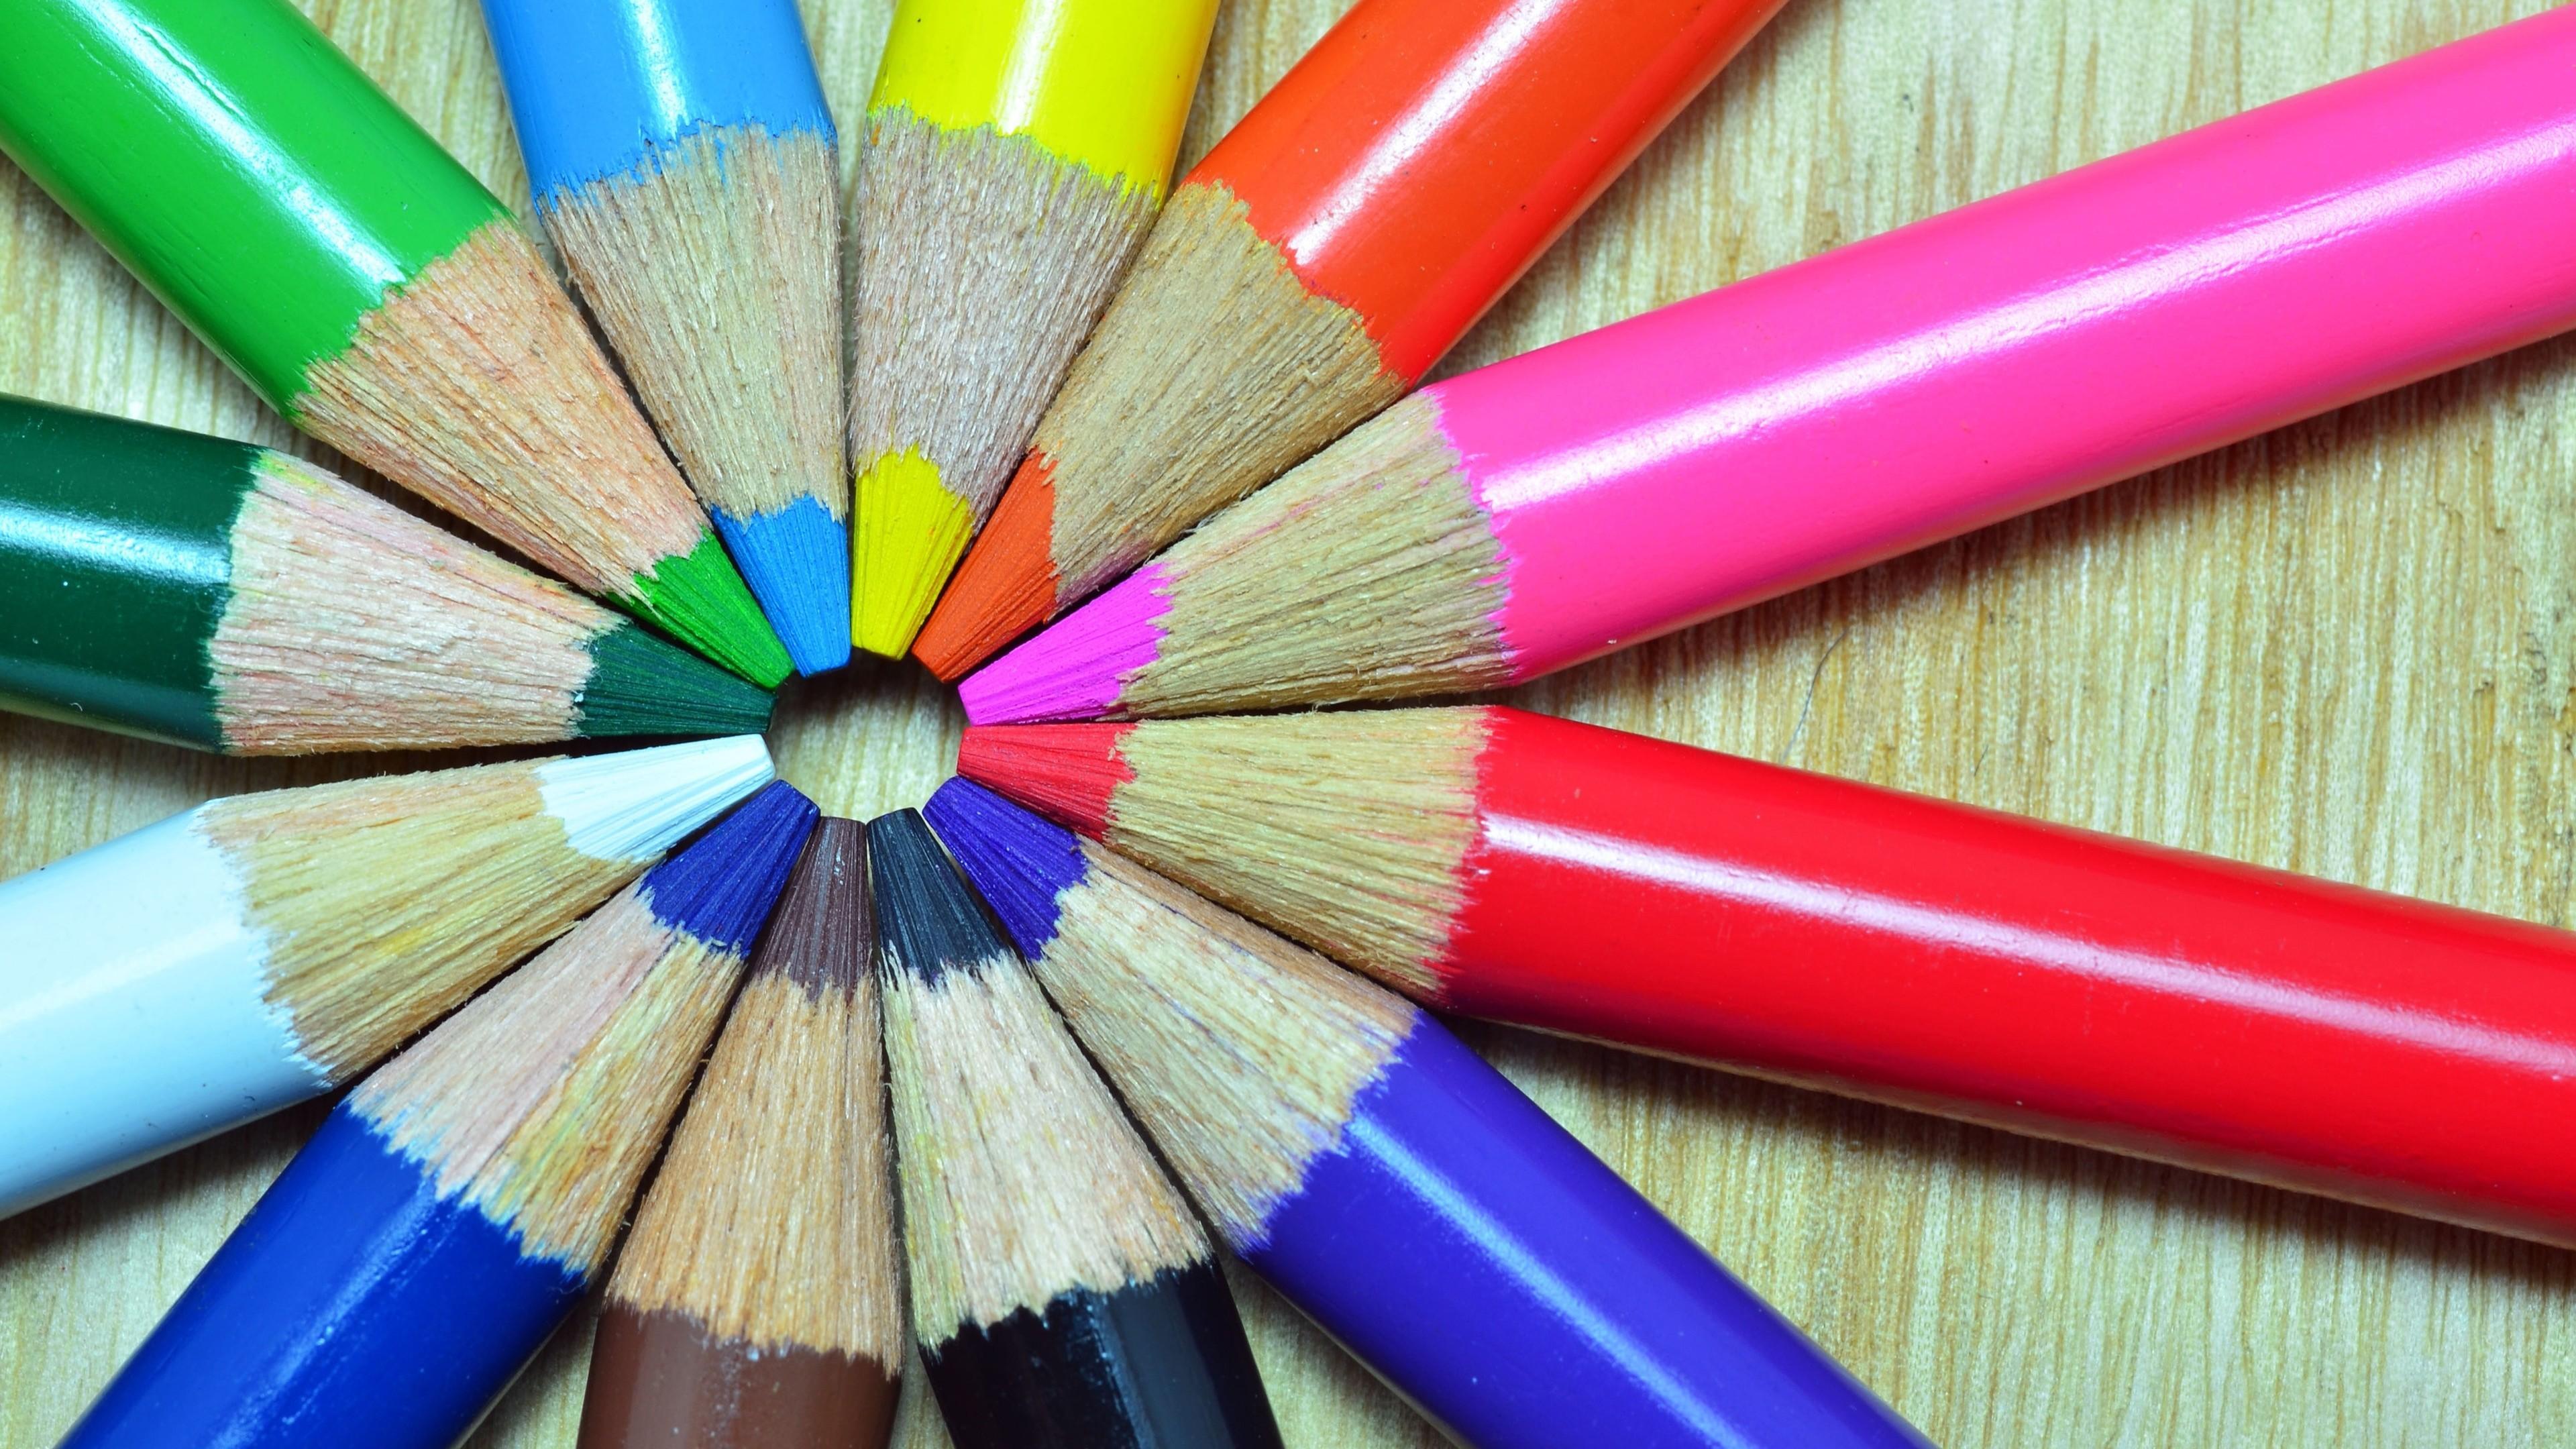 wallpaper colorful crayons art color wheel pencil 3840x2160